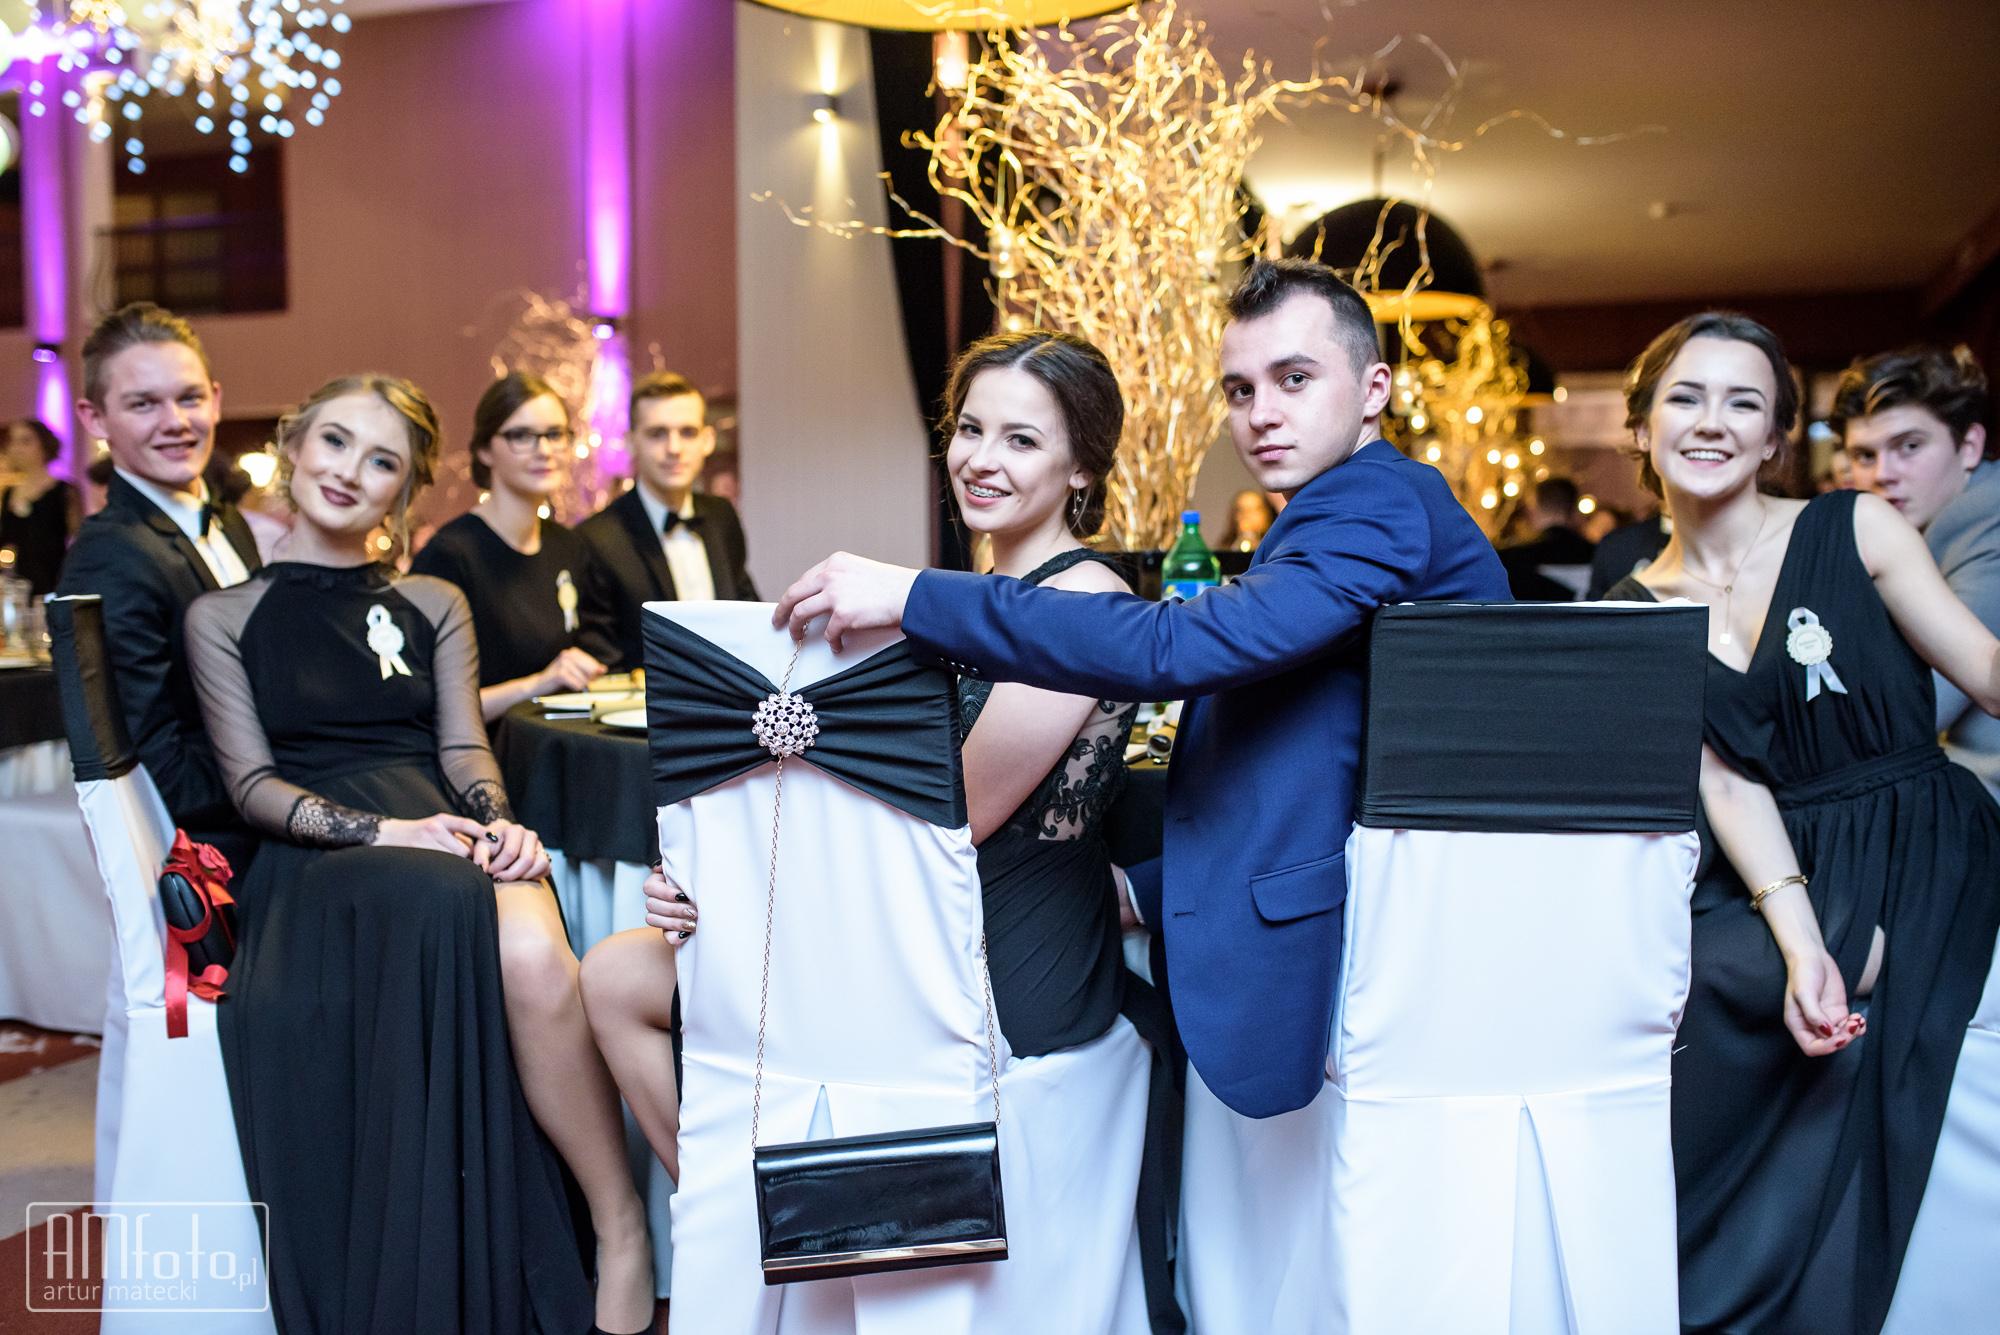 studniowka_2017_3LO_Kalisz_reportaz__www_amfoto_pl-0726.jpg